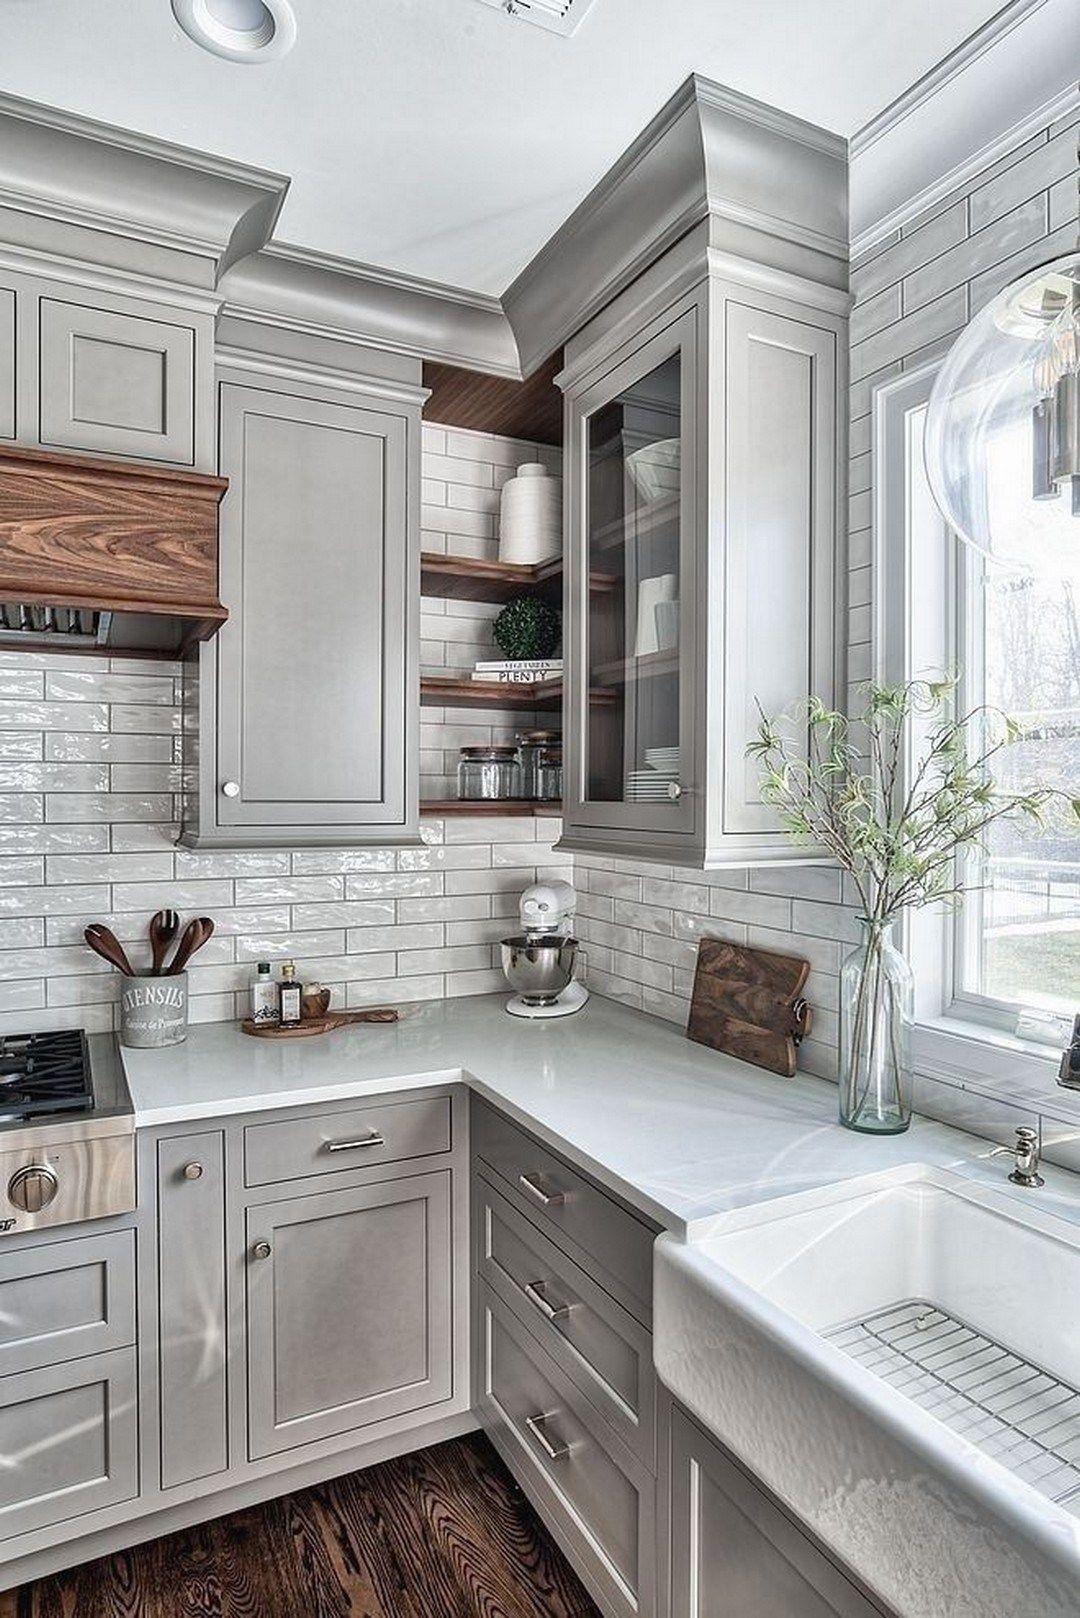 98 Diy Remodeled Kitchen In A Vintage 1900 S Country Farmhouse Farmhouse Room Home Decor Kitchen Kitchen Inspirations Kitchen Renovation